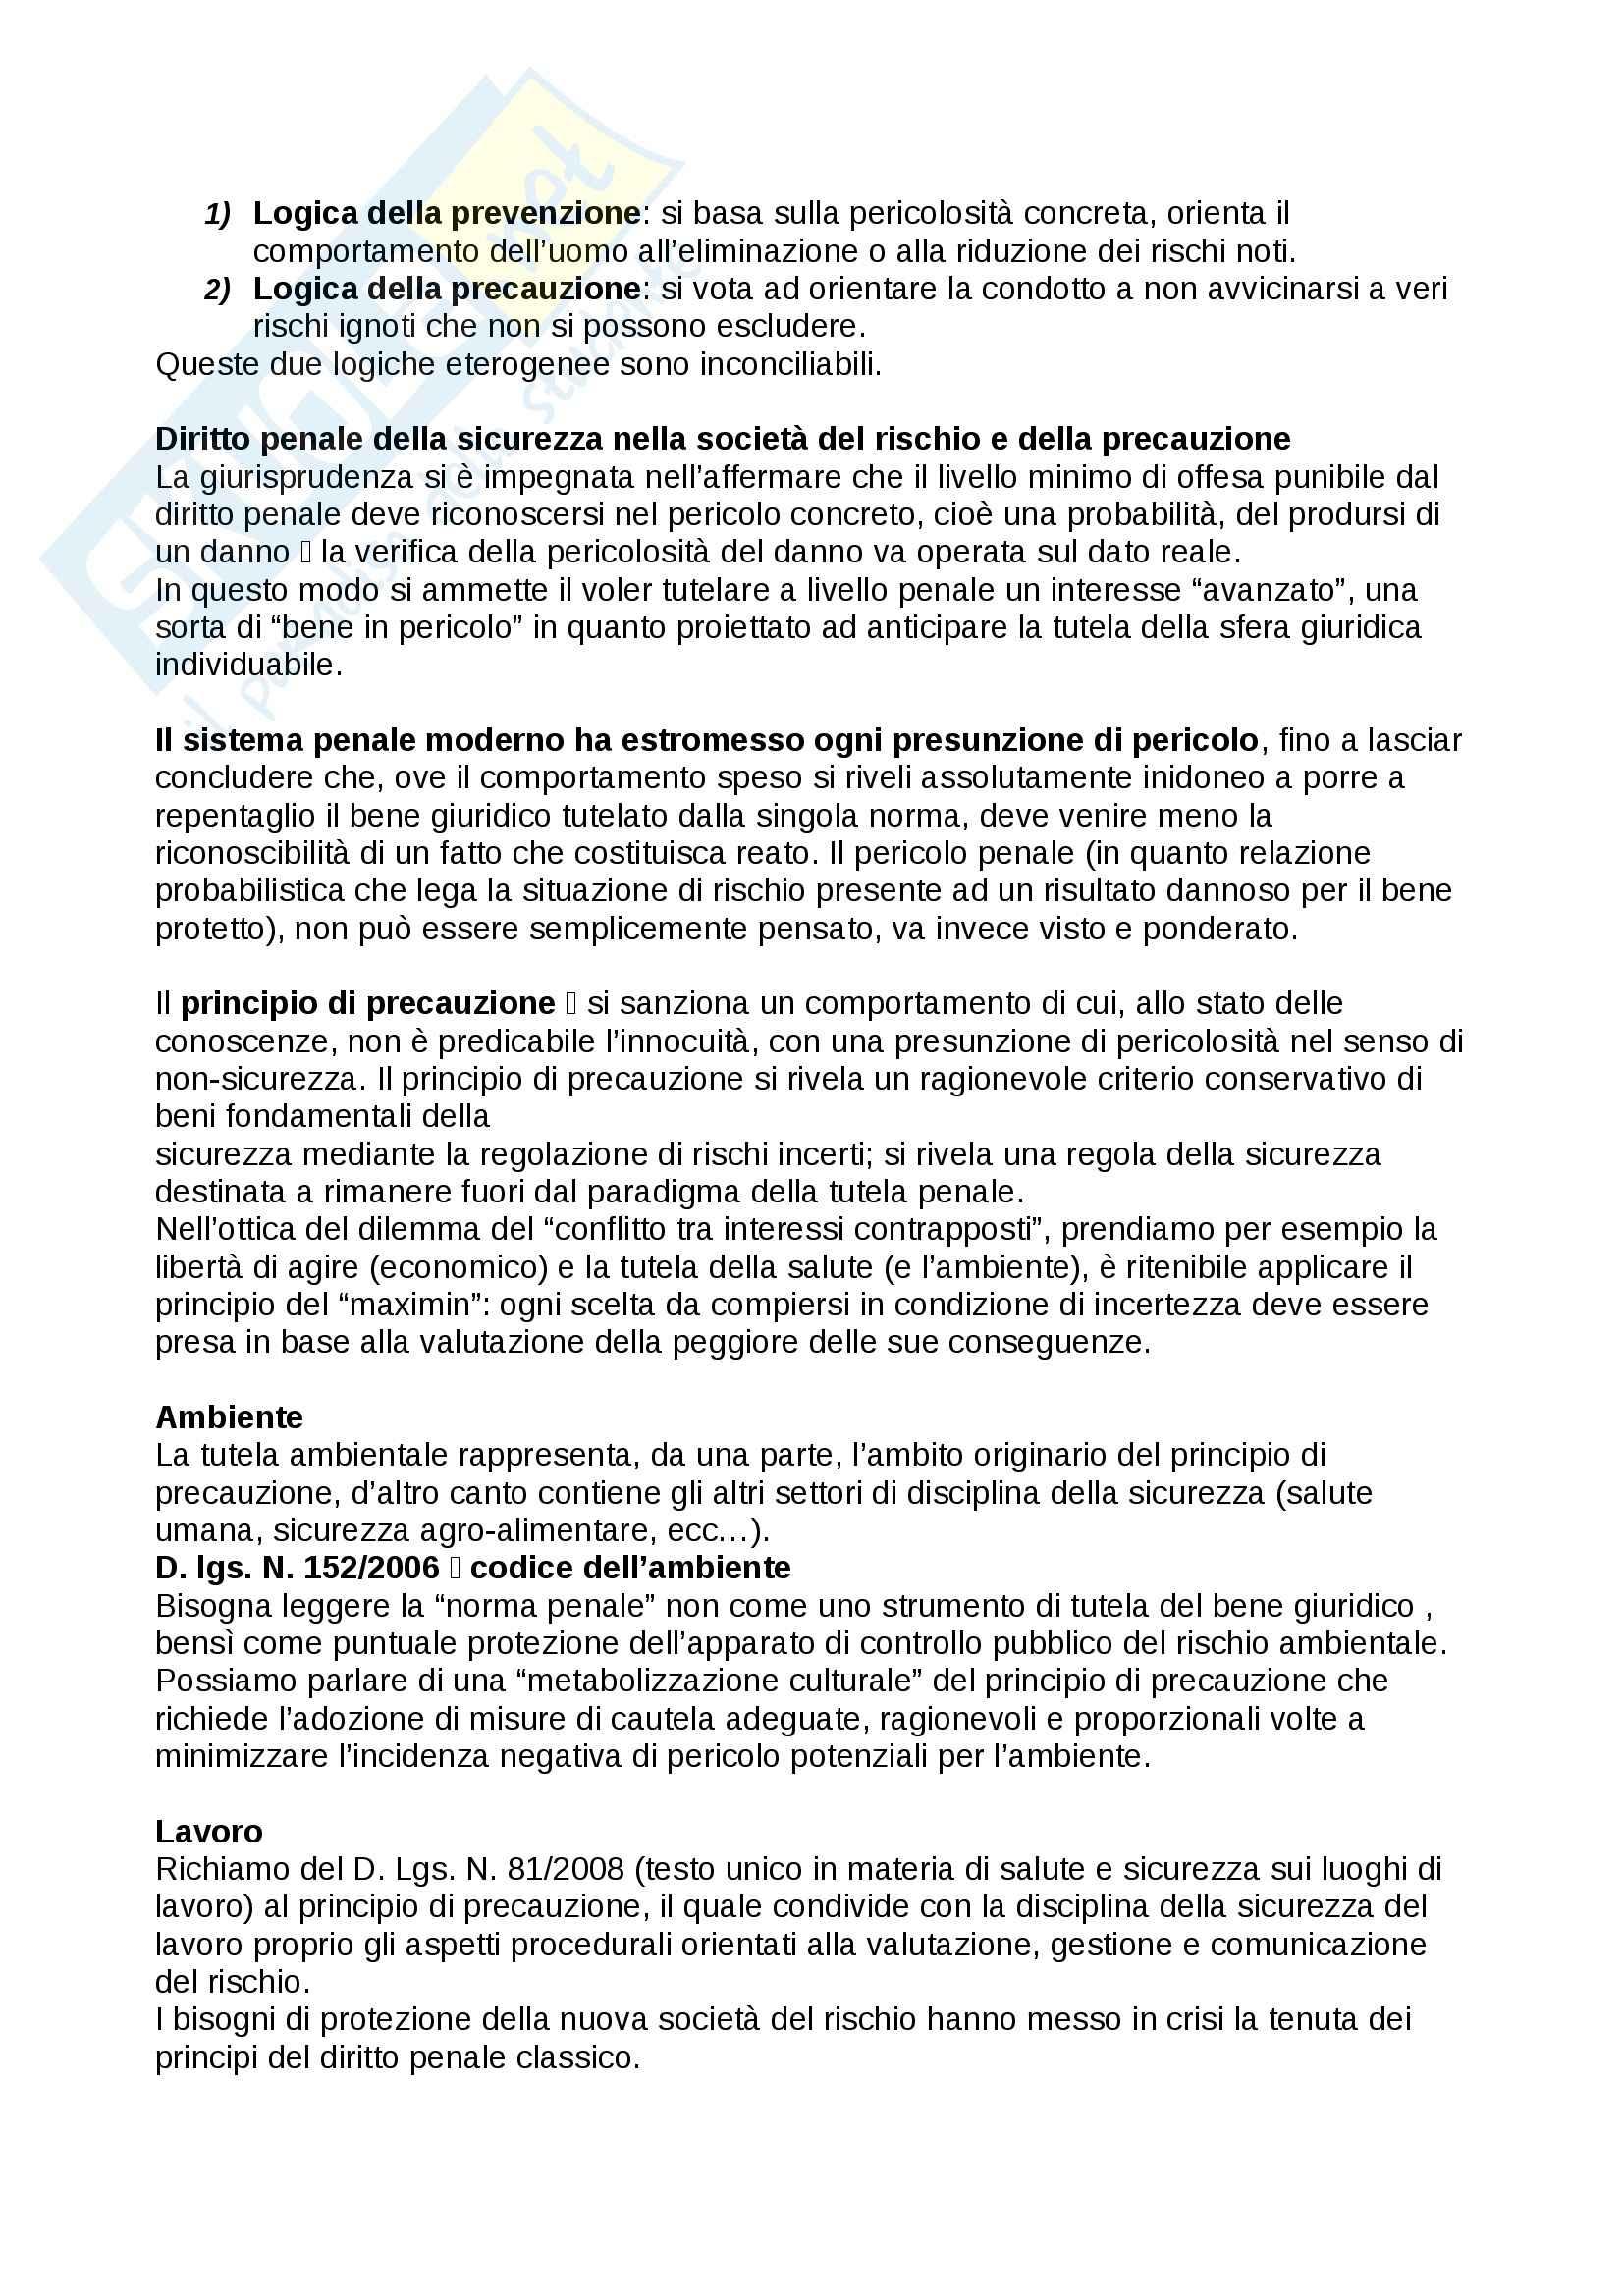 Riassunto esame Sociologia, prof. Federici, libro consigliato La sicurezza umana: un paradigma sociologico, Federici Pag. 11